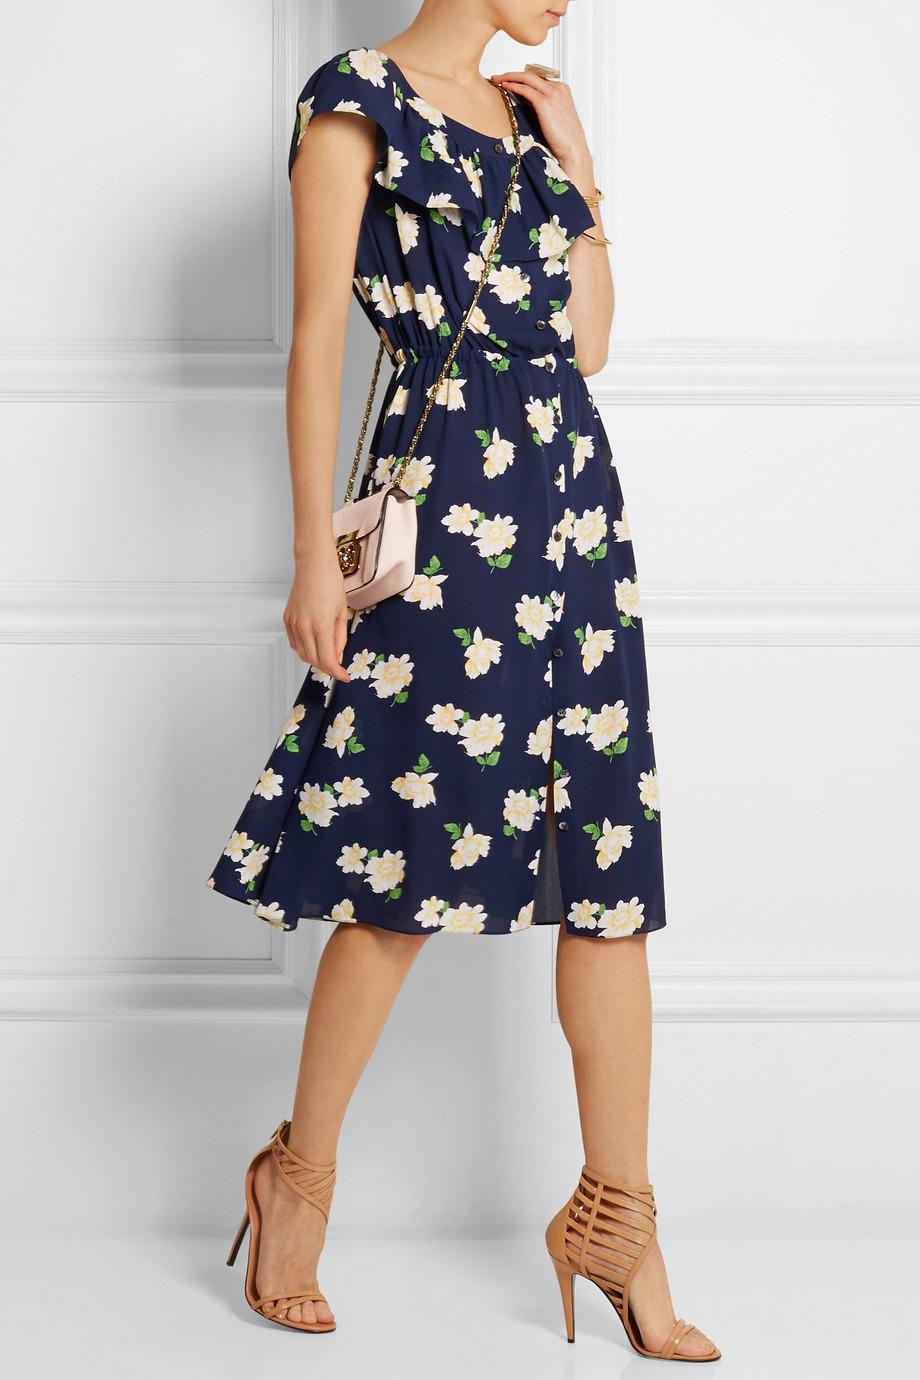 Lyst Michael Kors Floral Print Silk Crepe Midi Dress In Blue